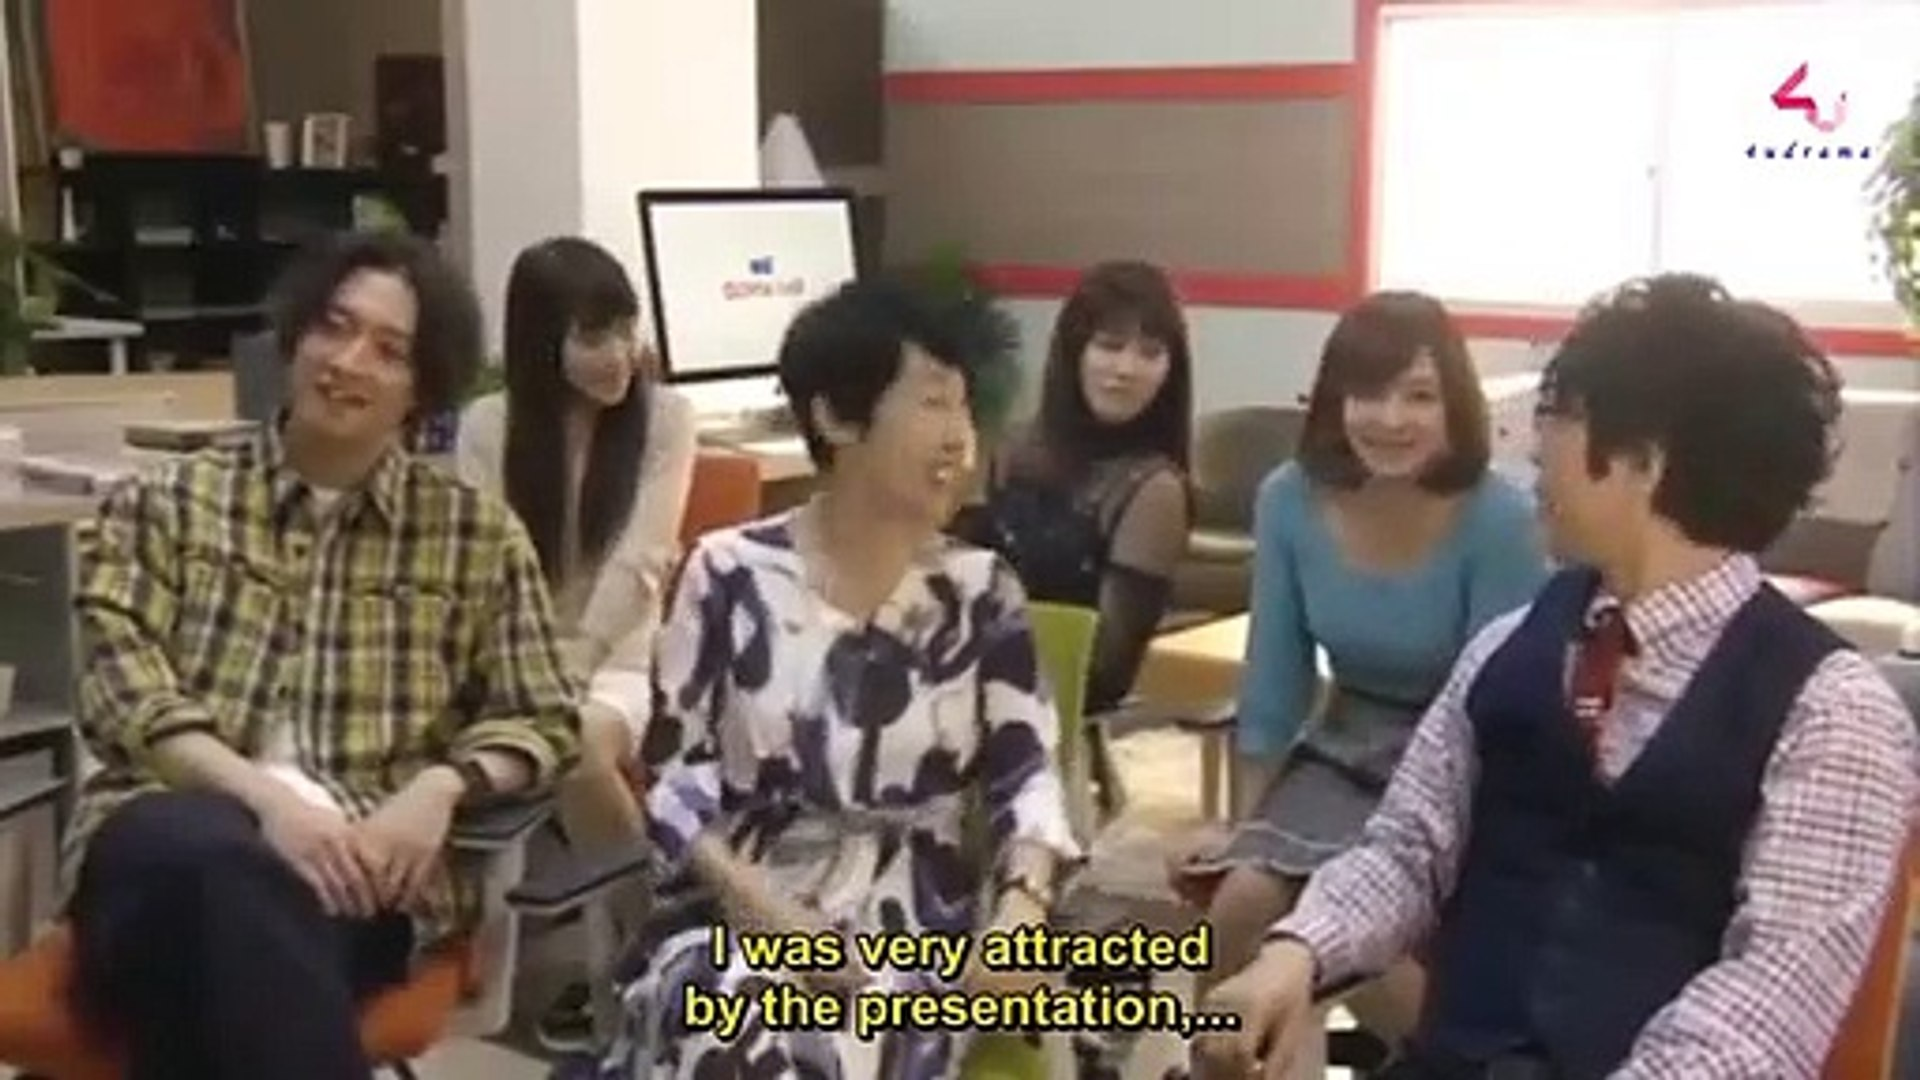 Love Rerun - ラブリラン - E3 English Subtitles